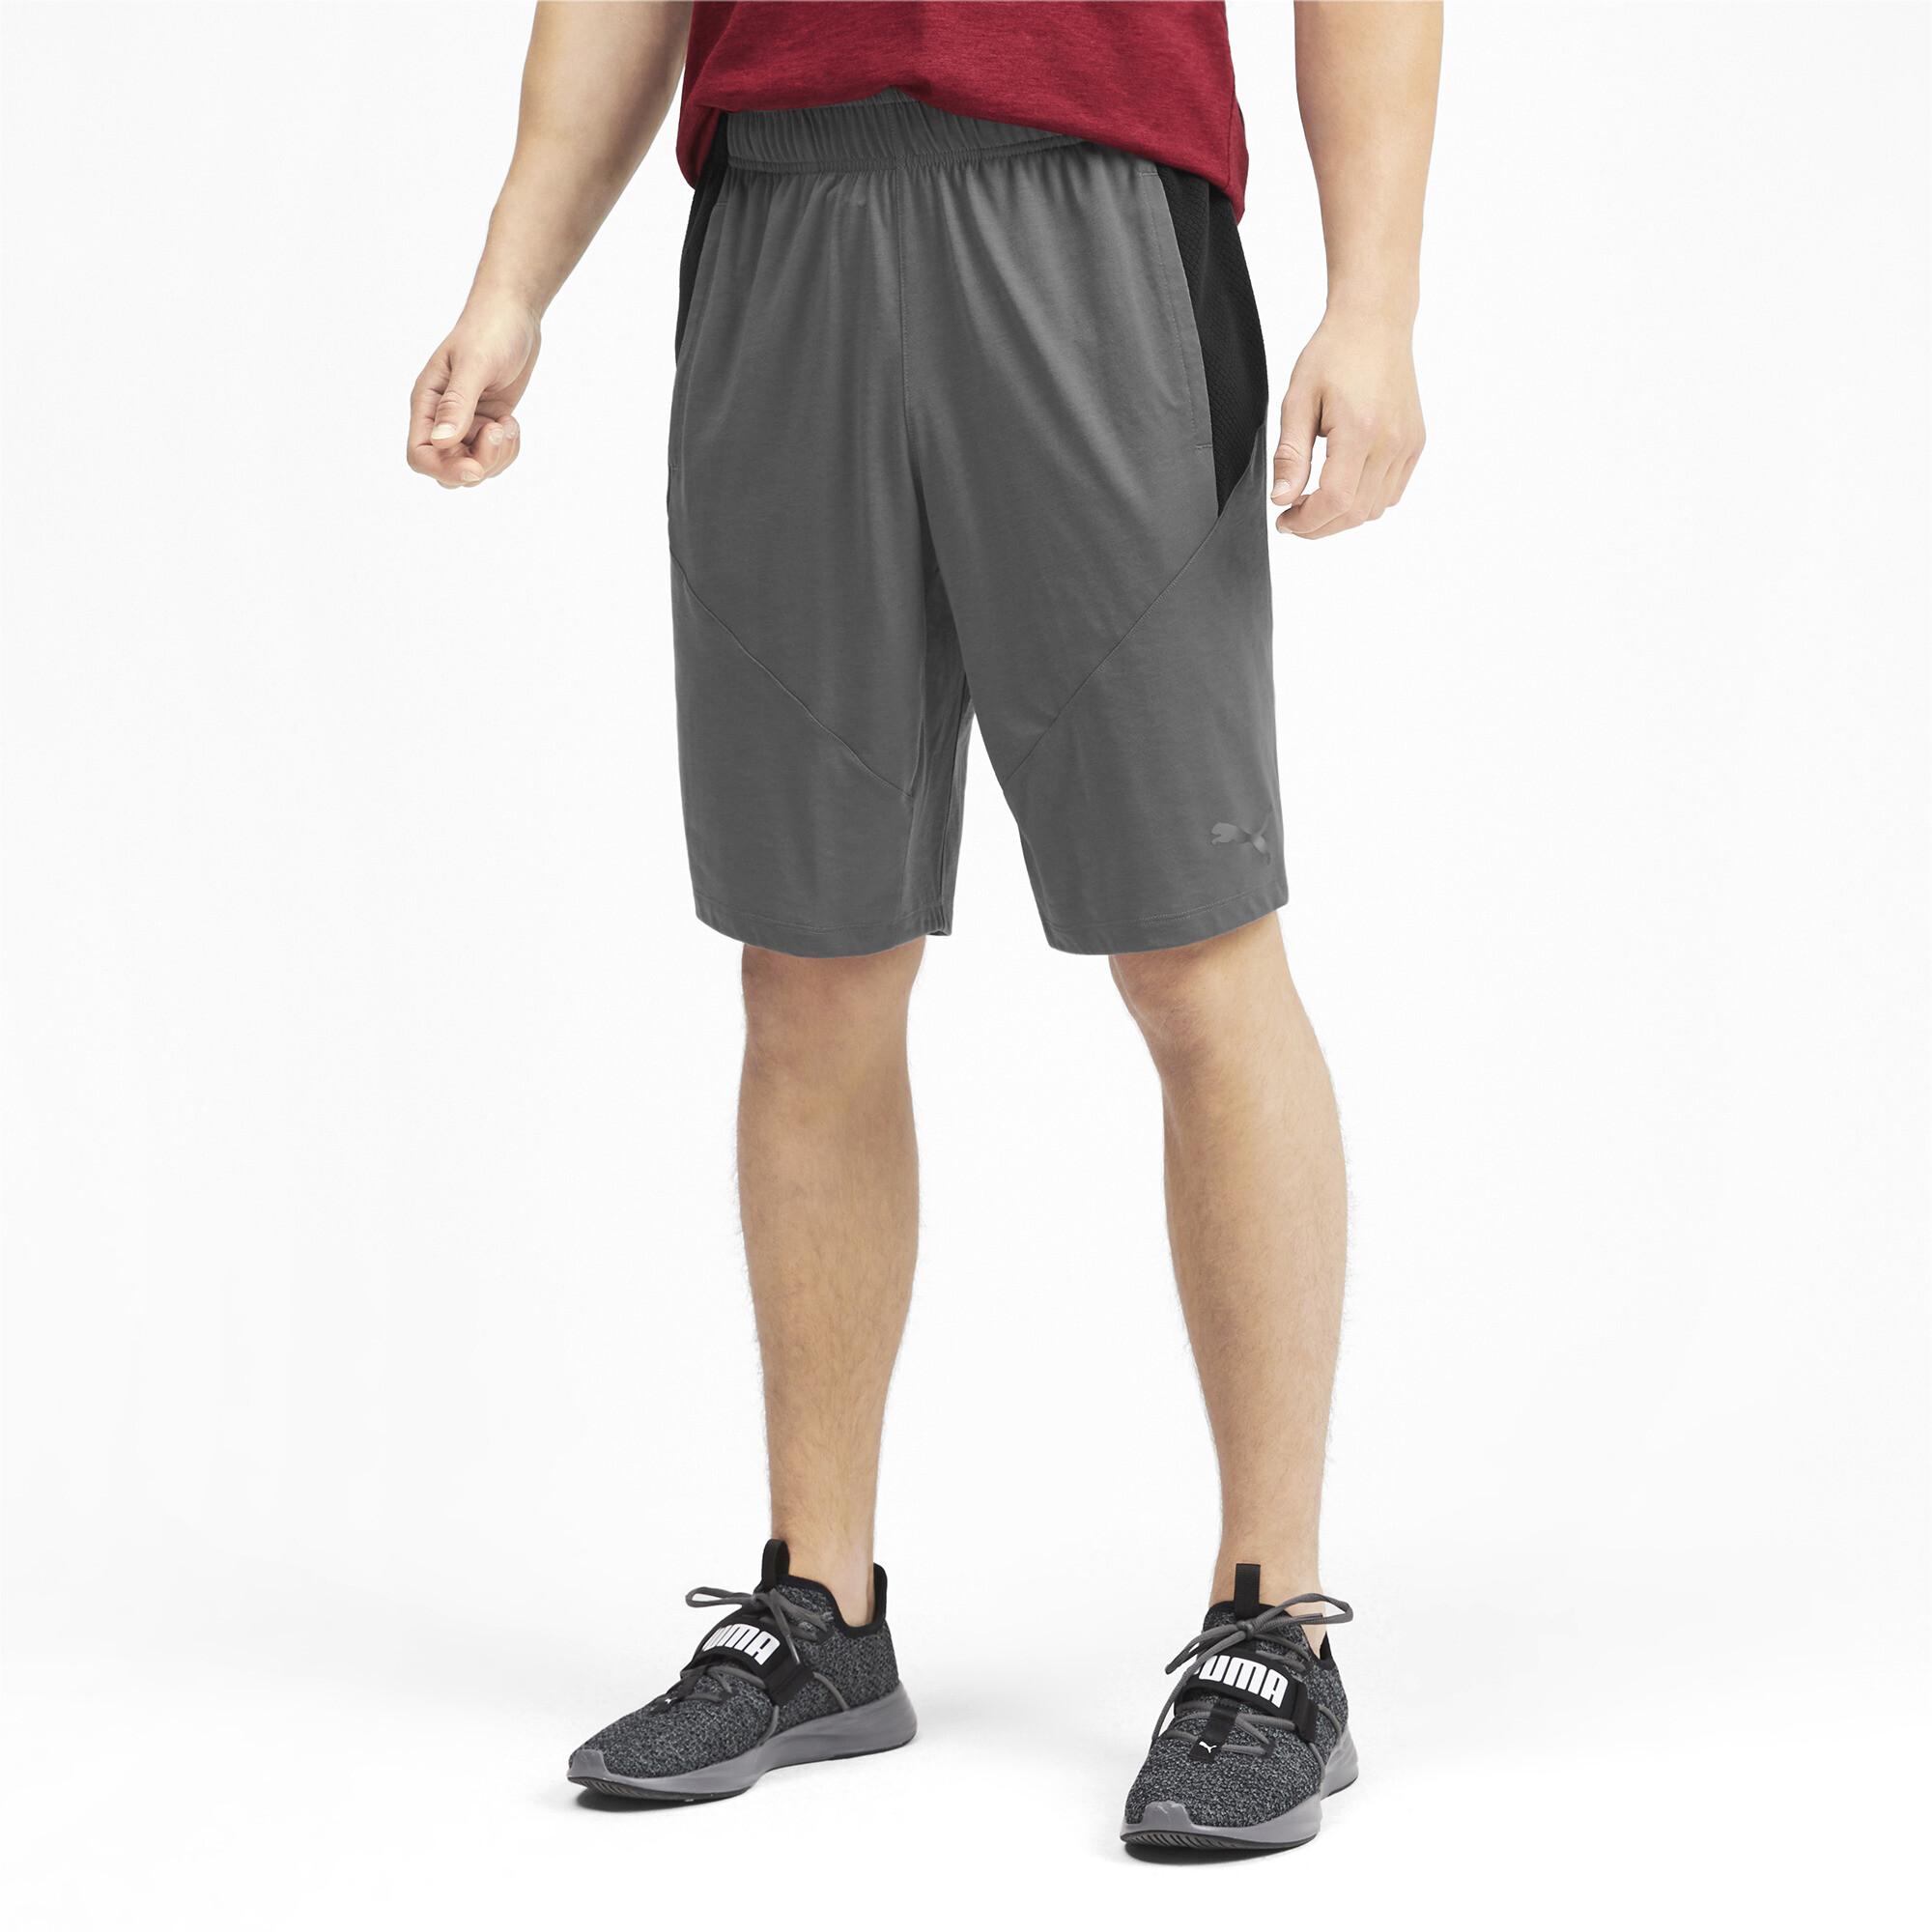 PUMA-Reactive-Drirelease-Men-039-s-Shorts-Men-Knitted-Shorts-Training thumbnail 4